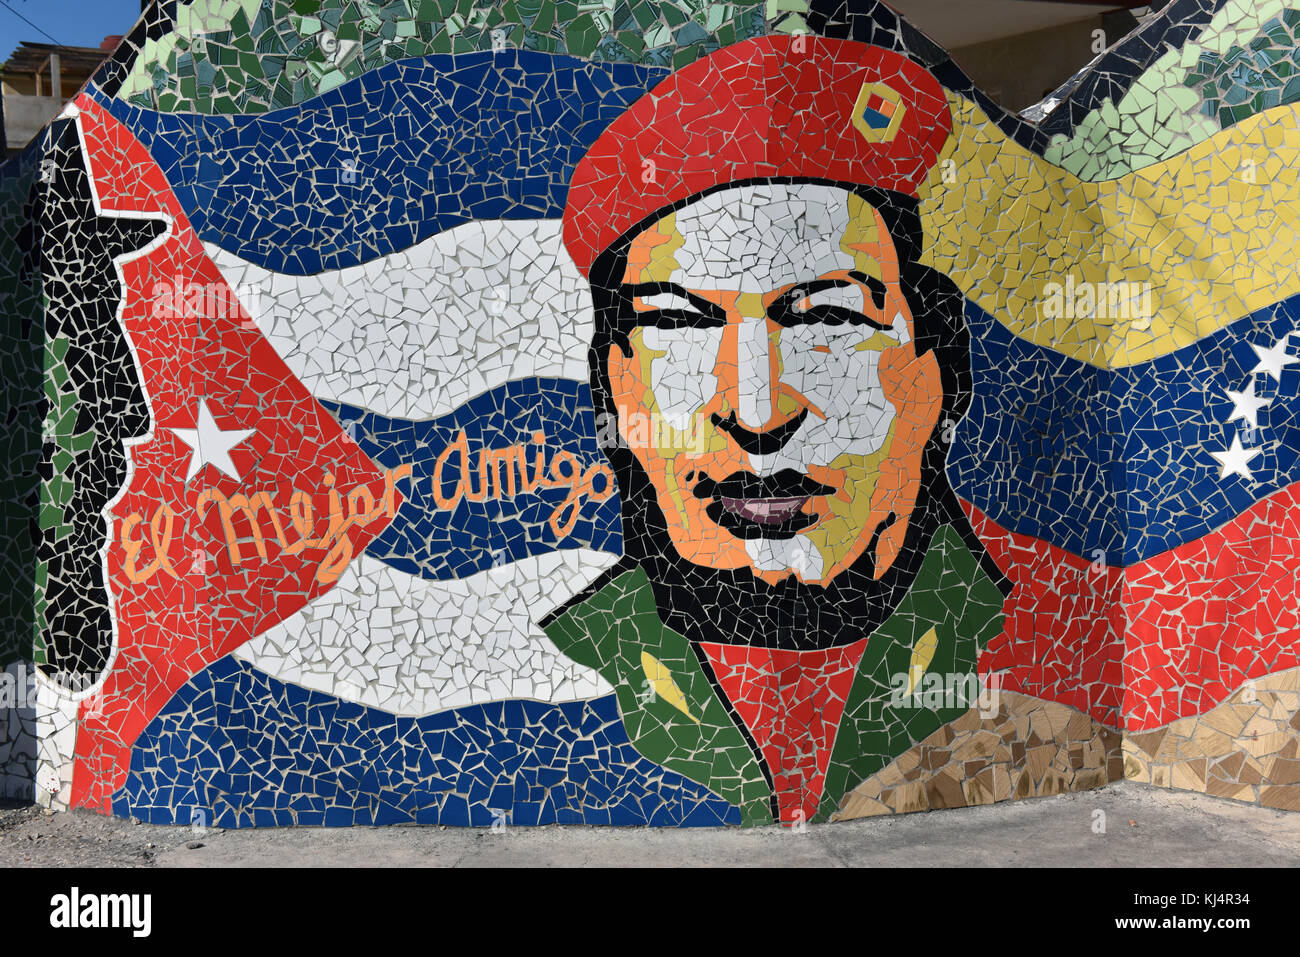 Fusterlandia Cuba - Stock Image